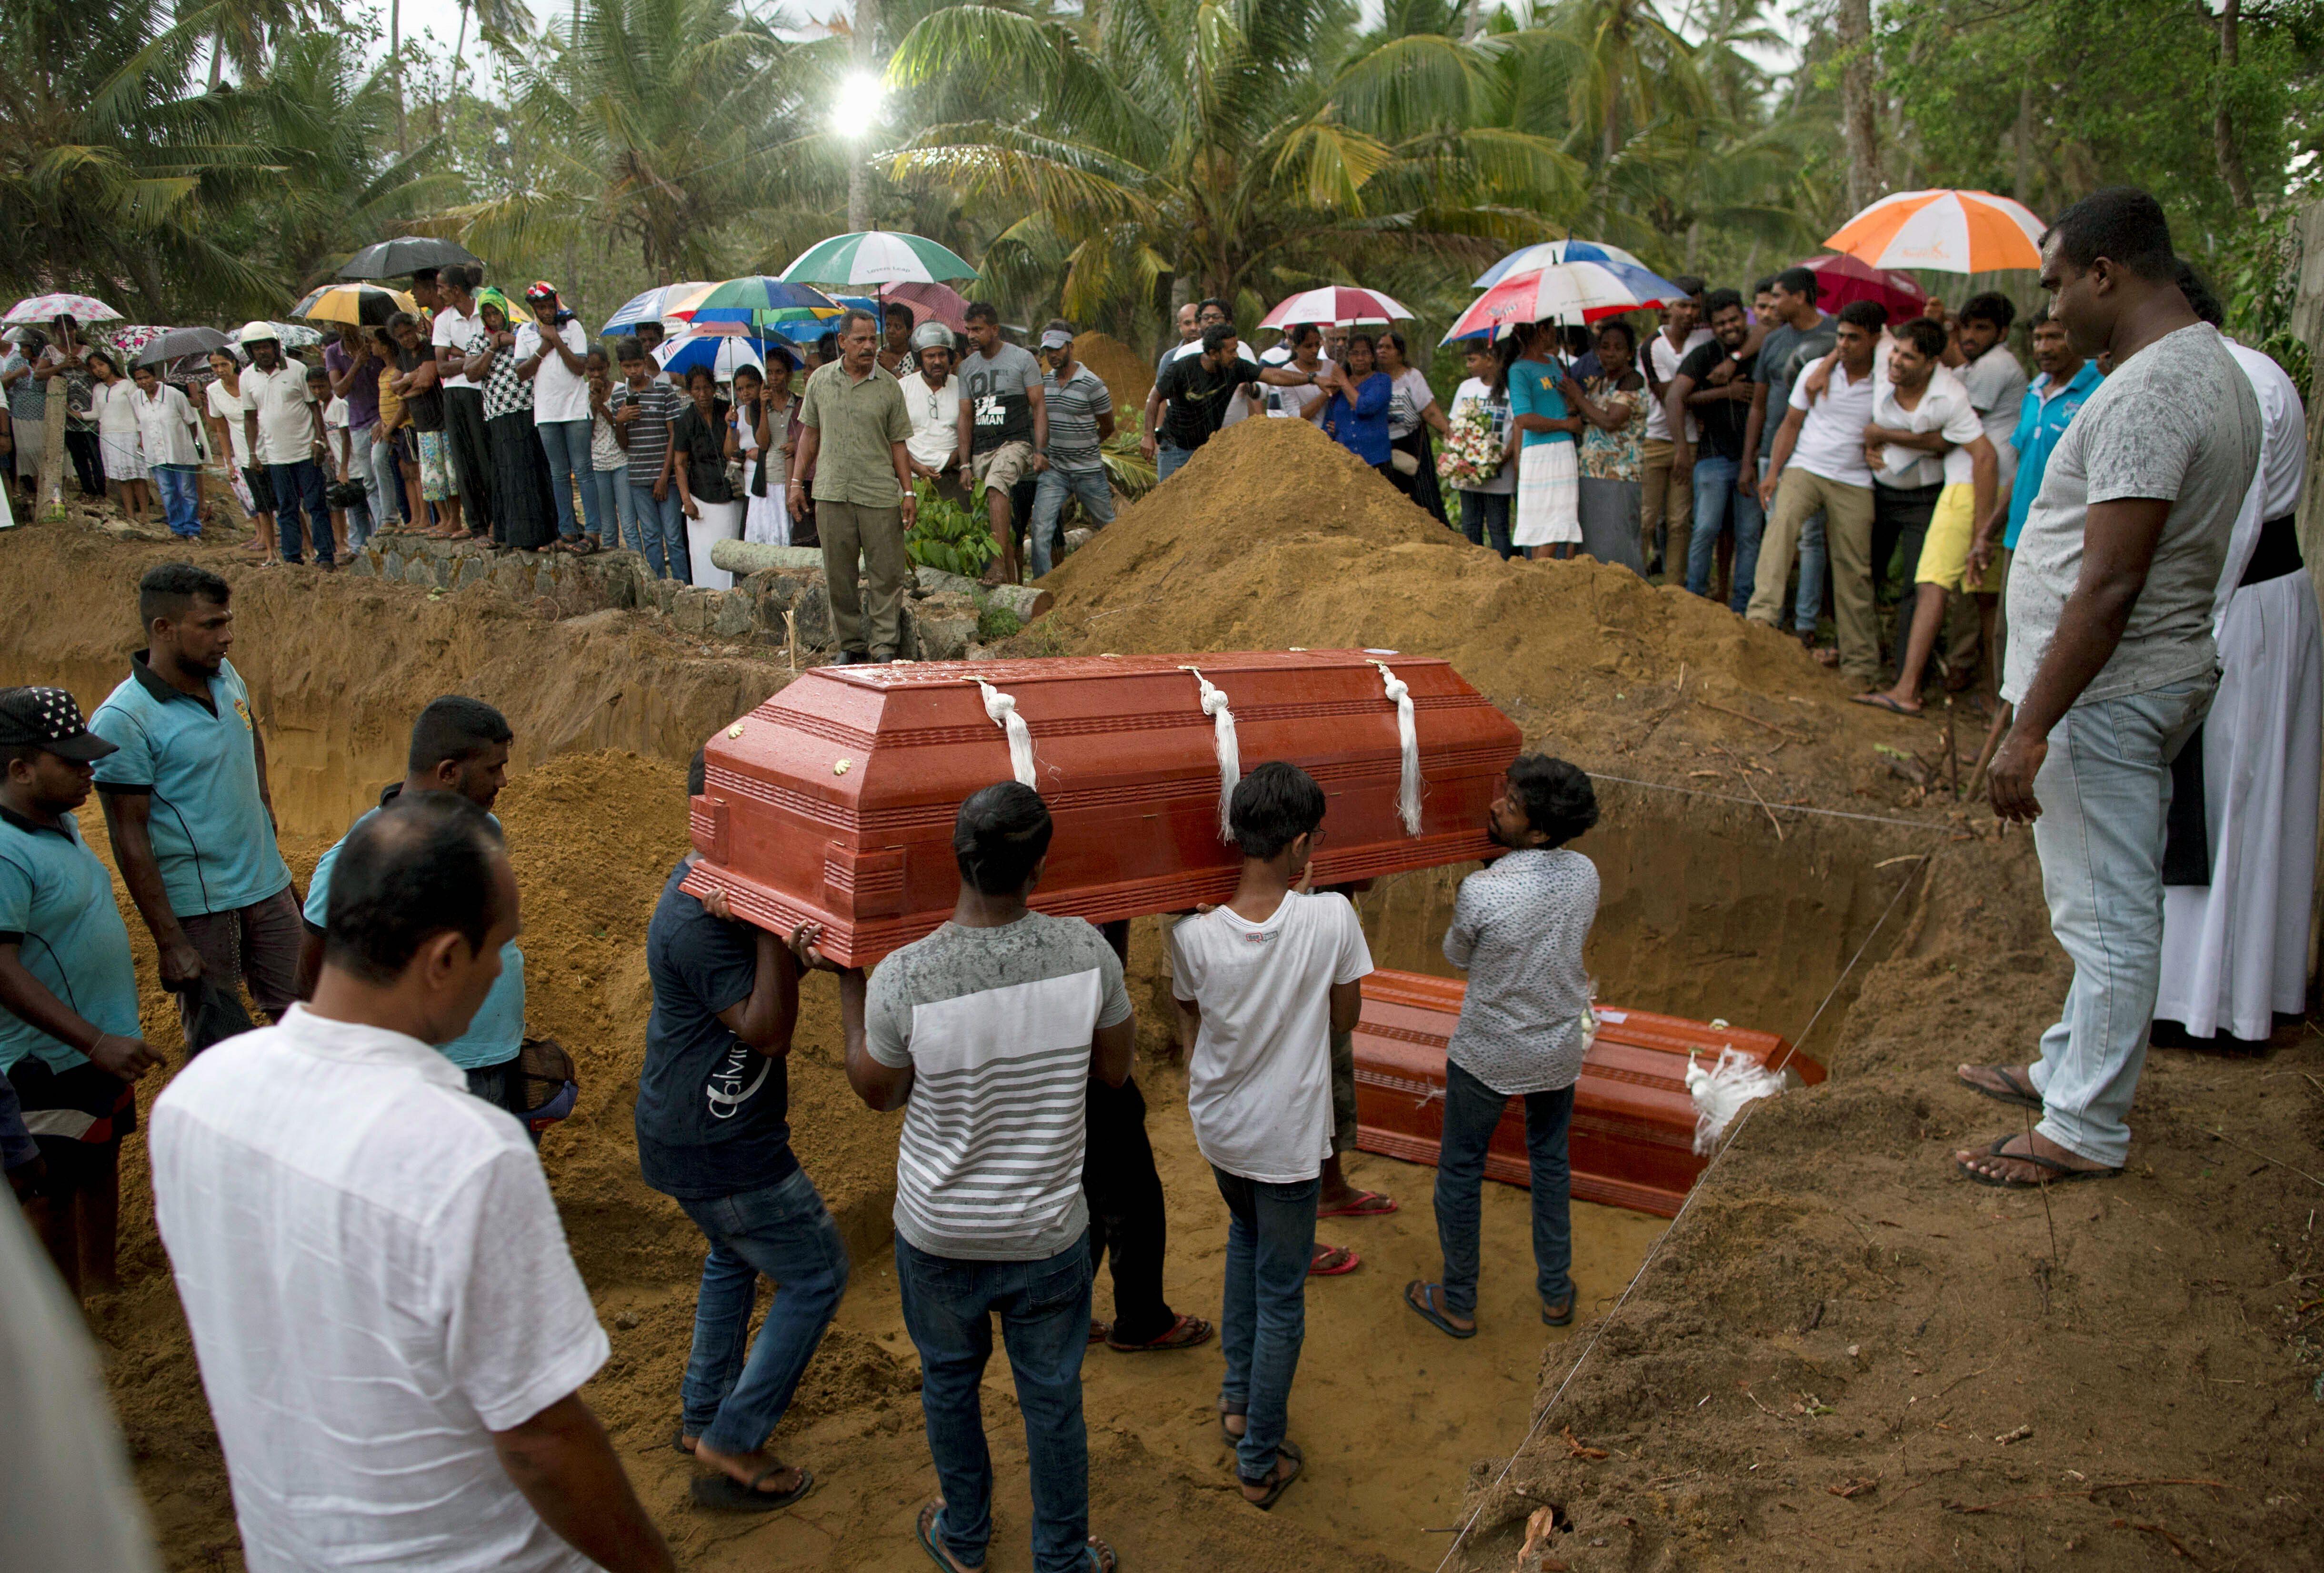 Sri Lanka Easter attack result of international network